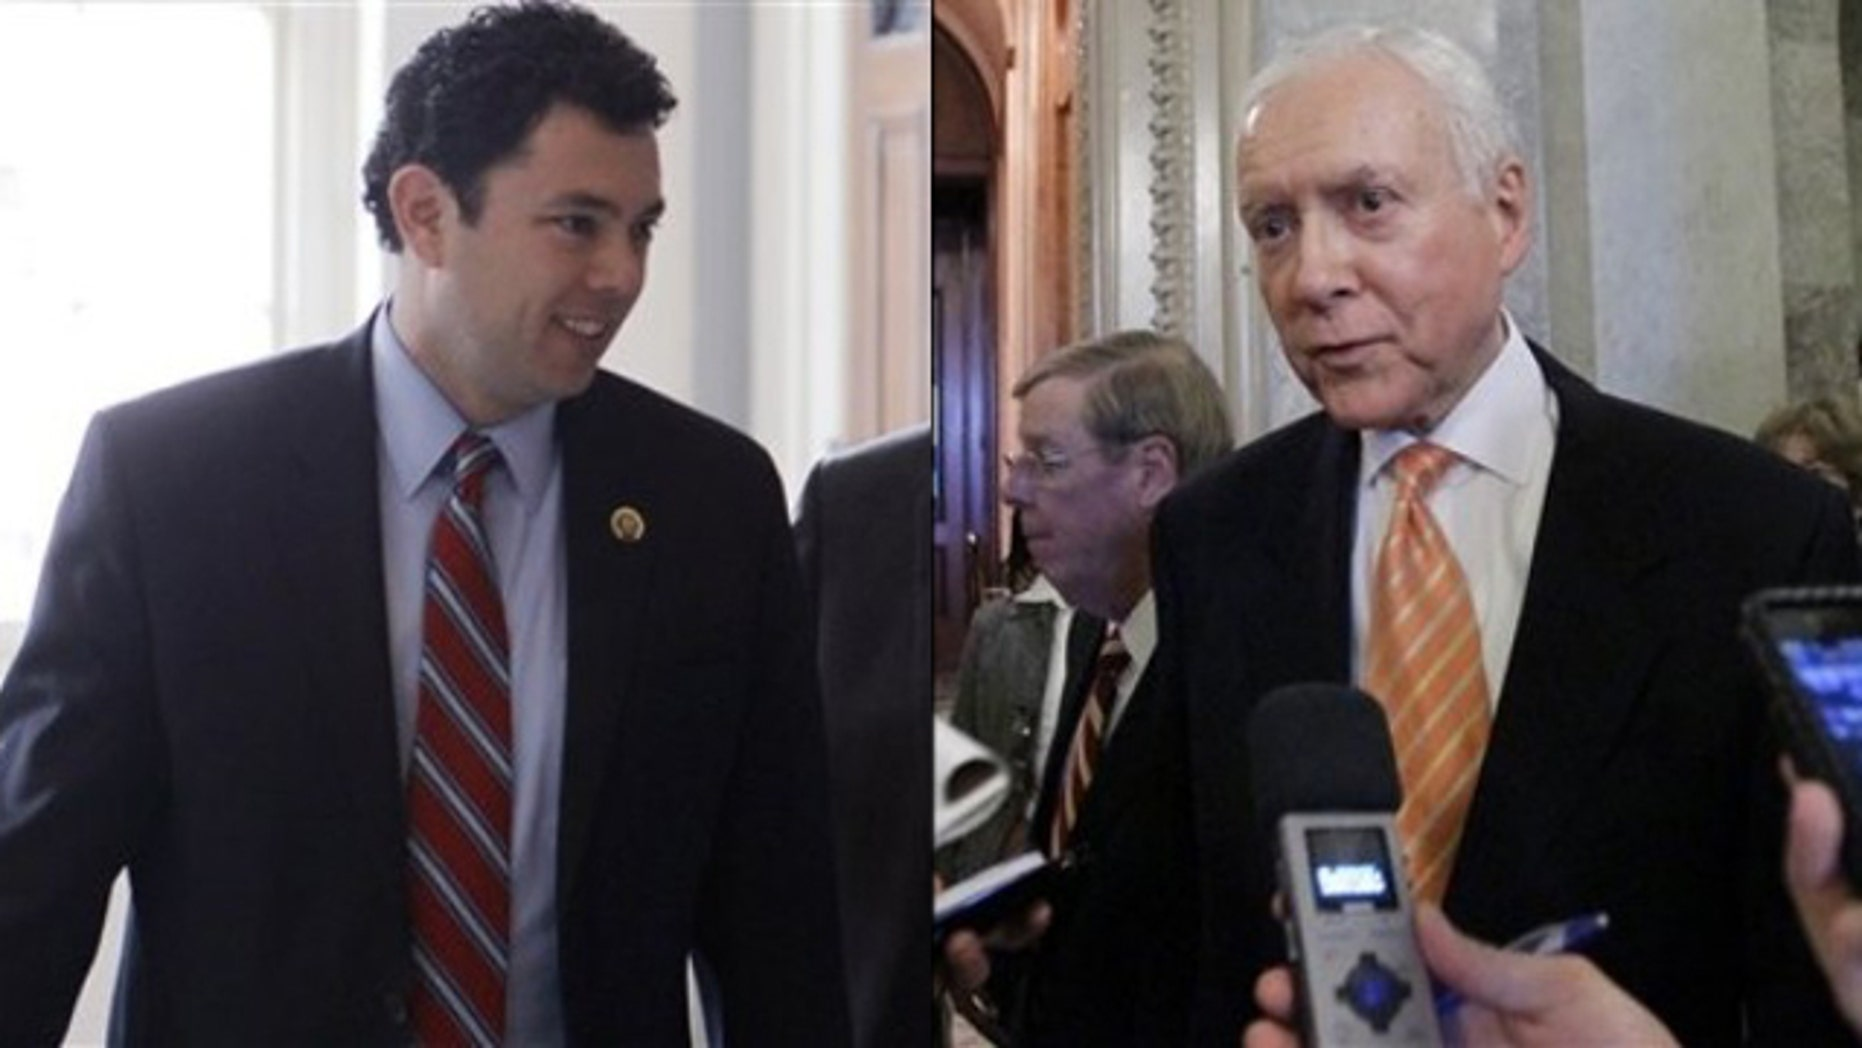 Shown here are Rep. Jason Chaffetz, left, and Sen. Orrin Hatch.